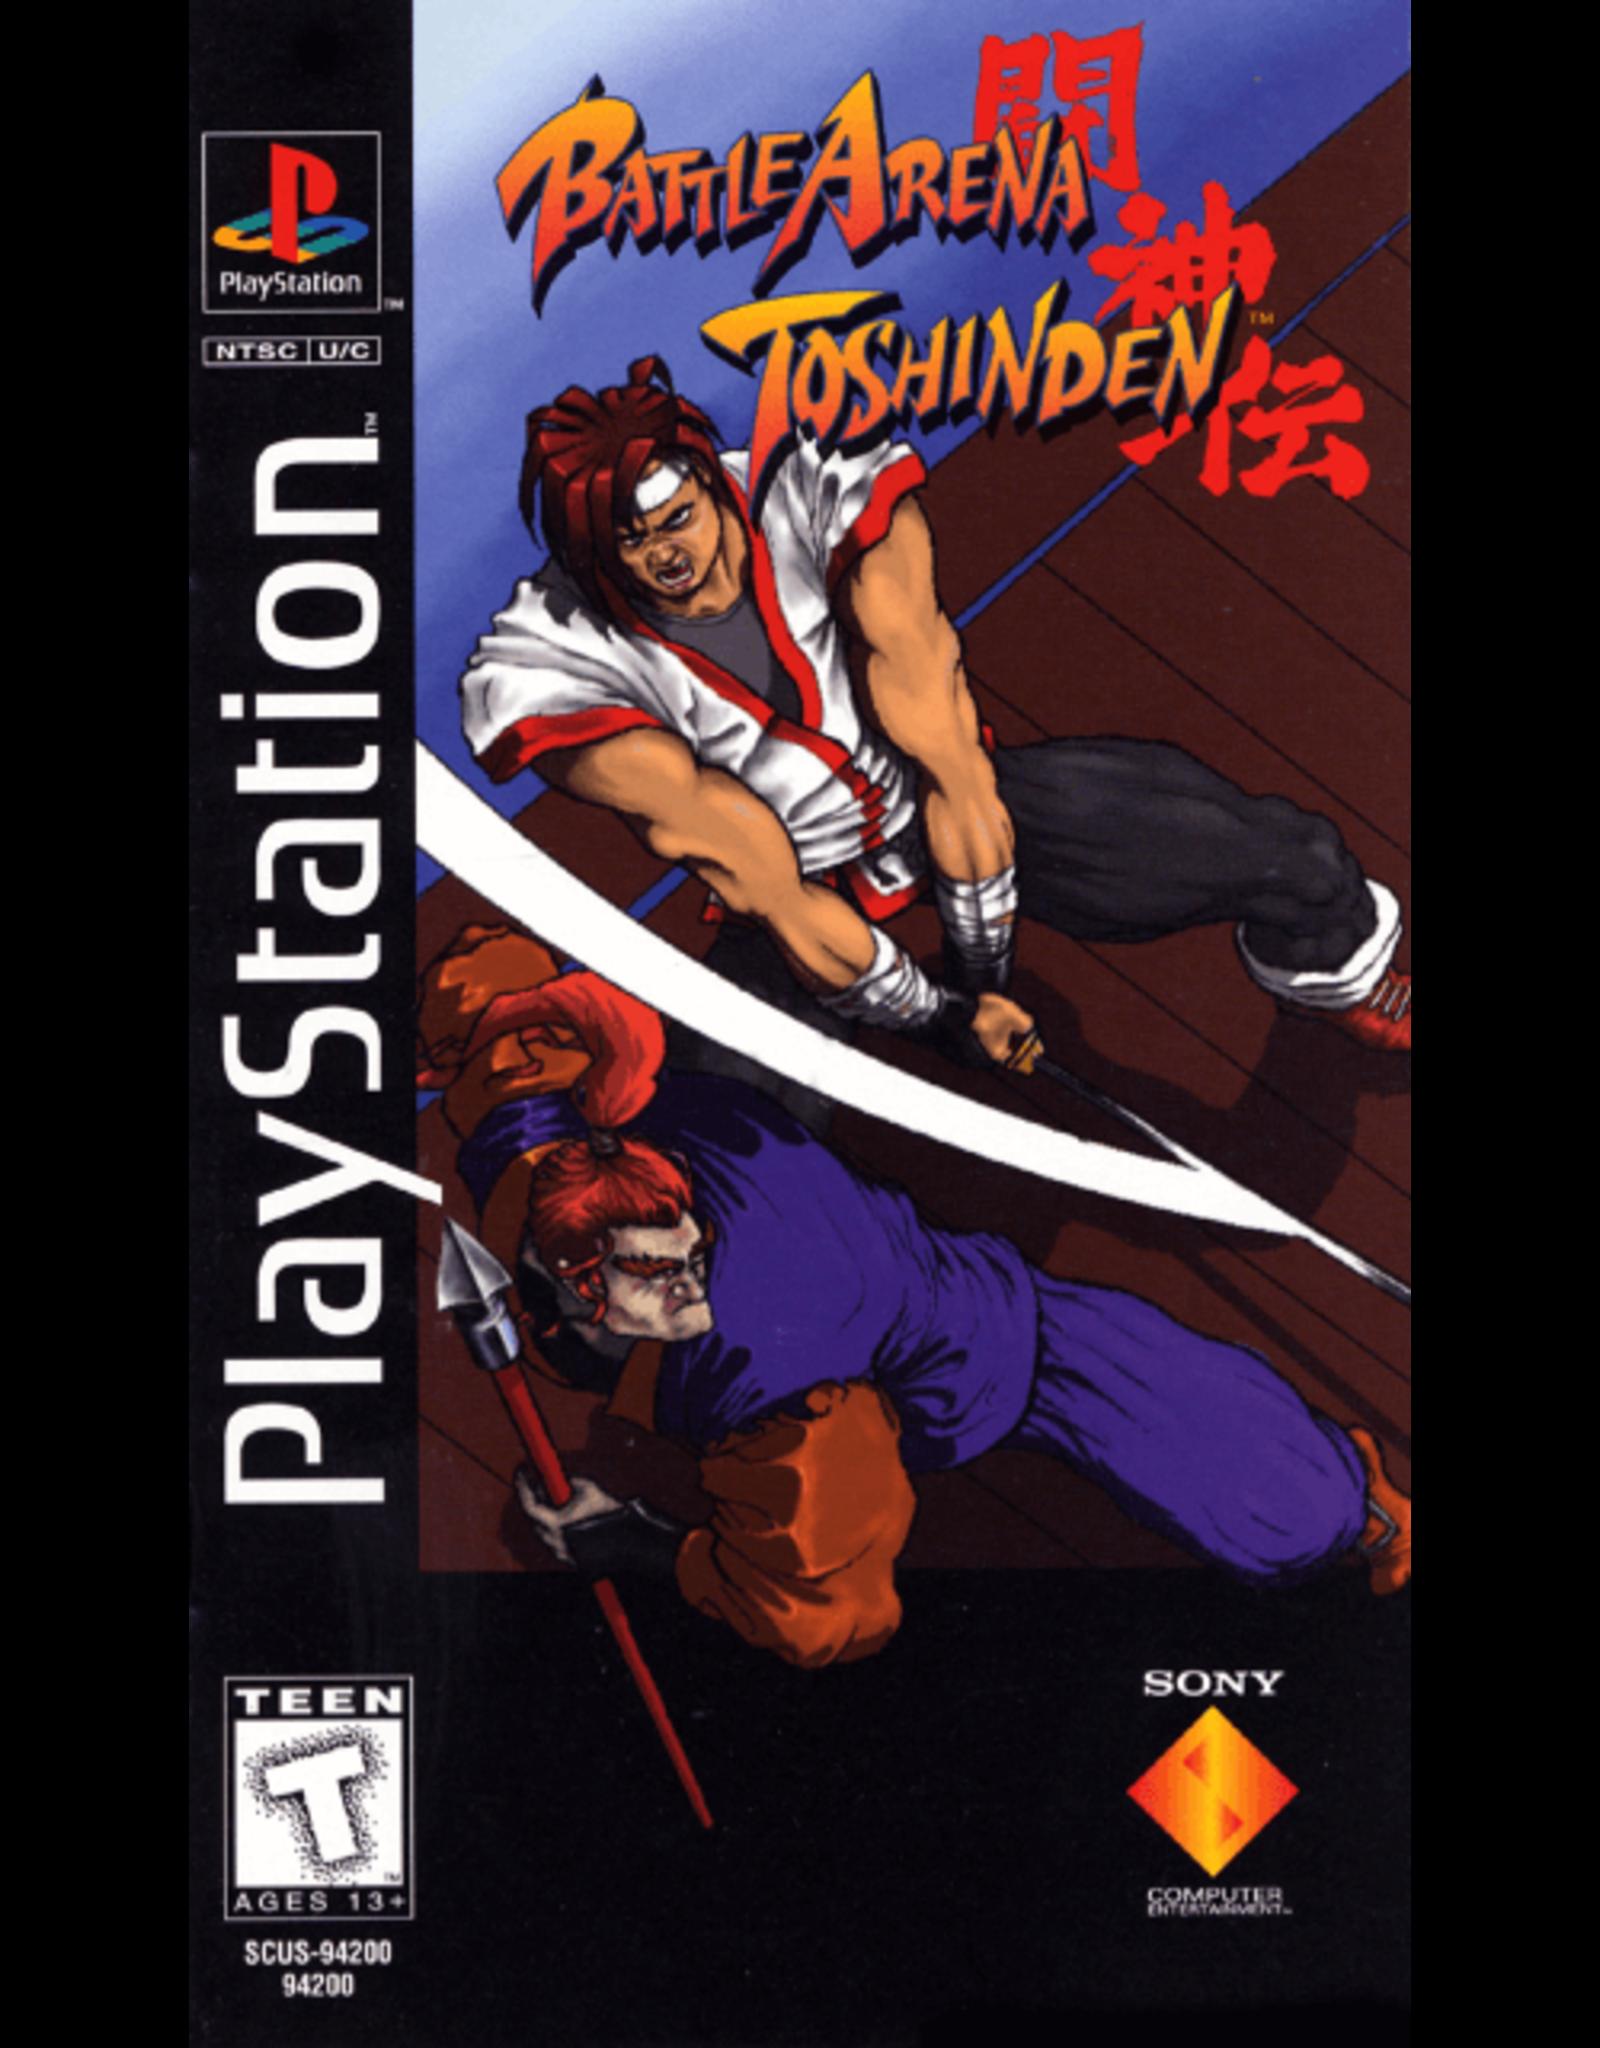 Playstation Battle Arena Toshinden (Long Box, CiB)